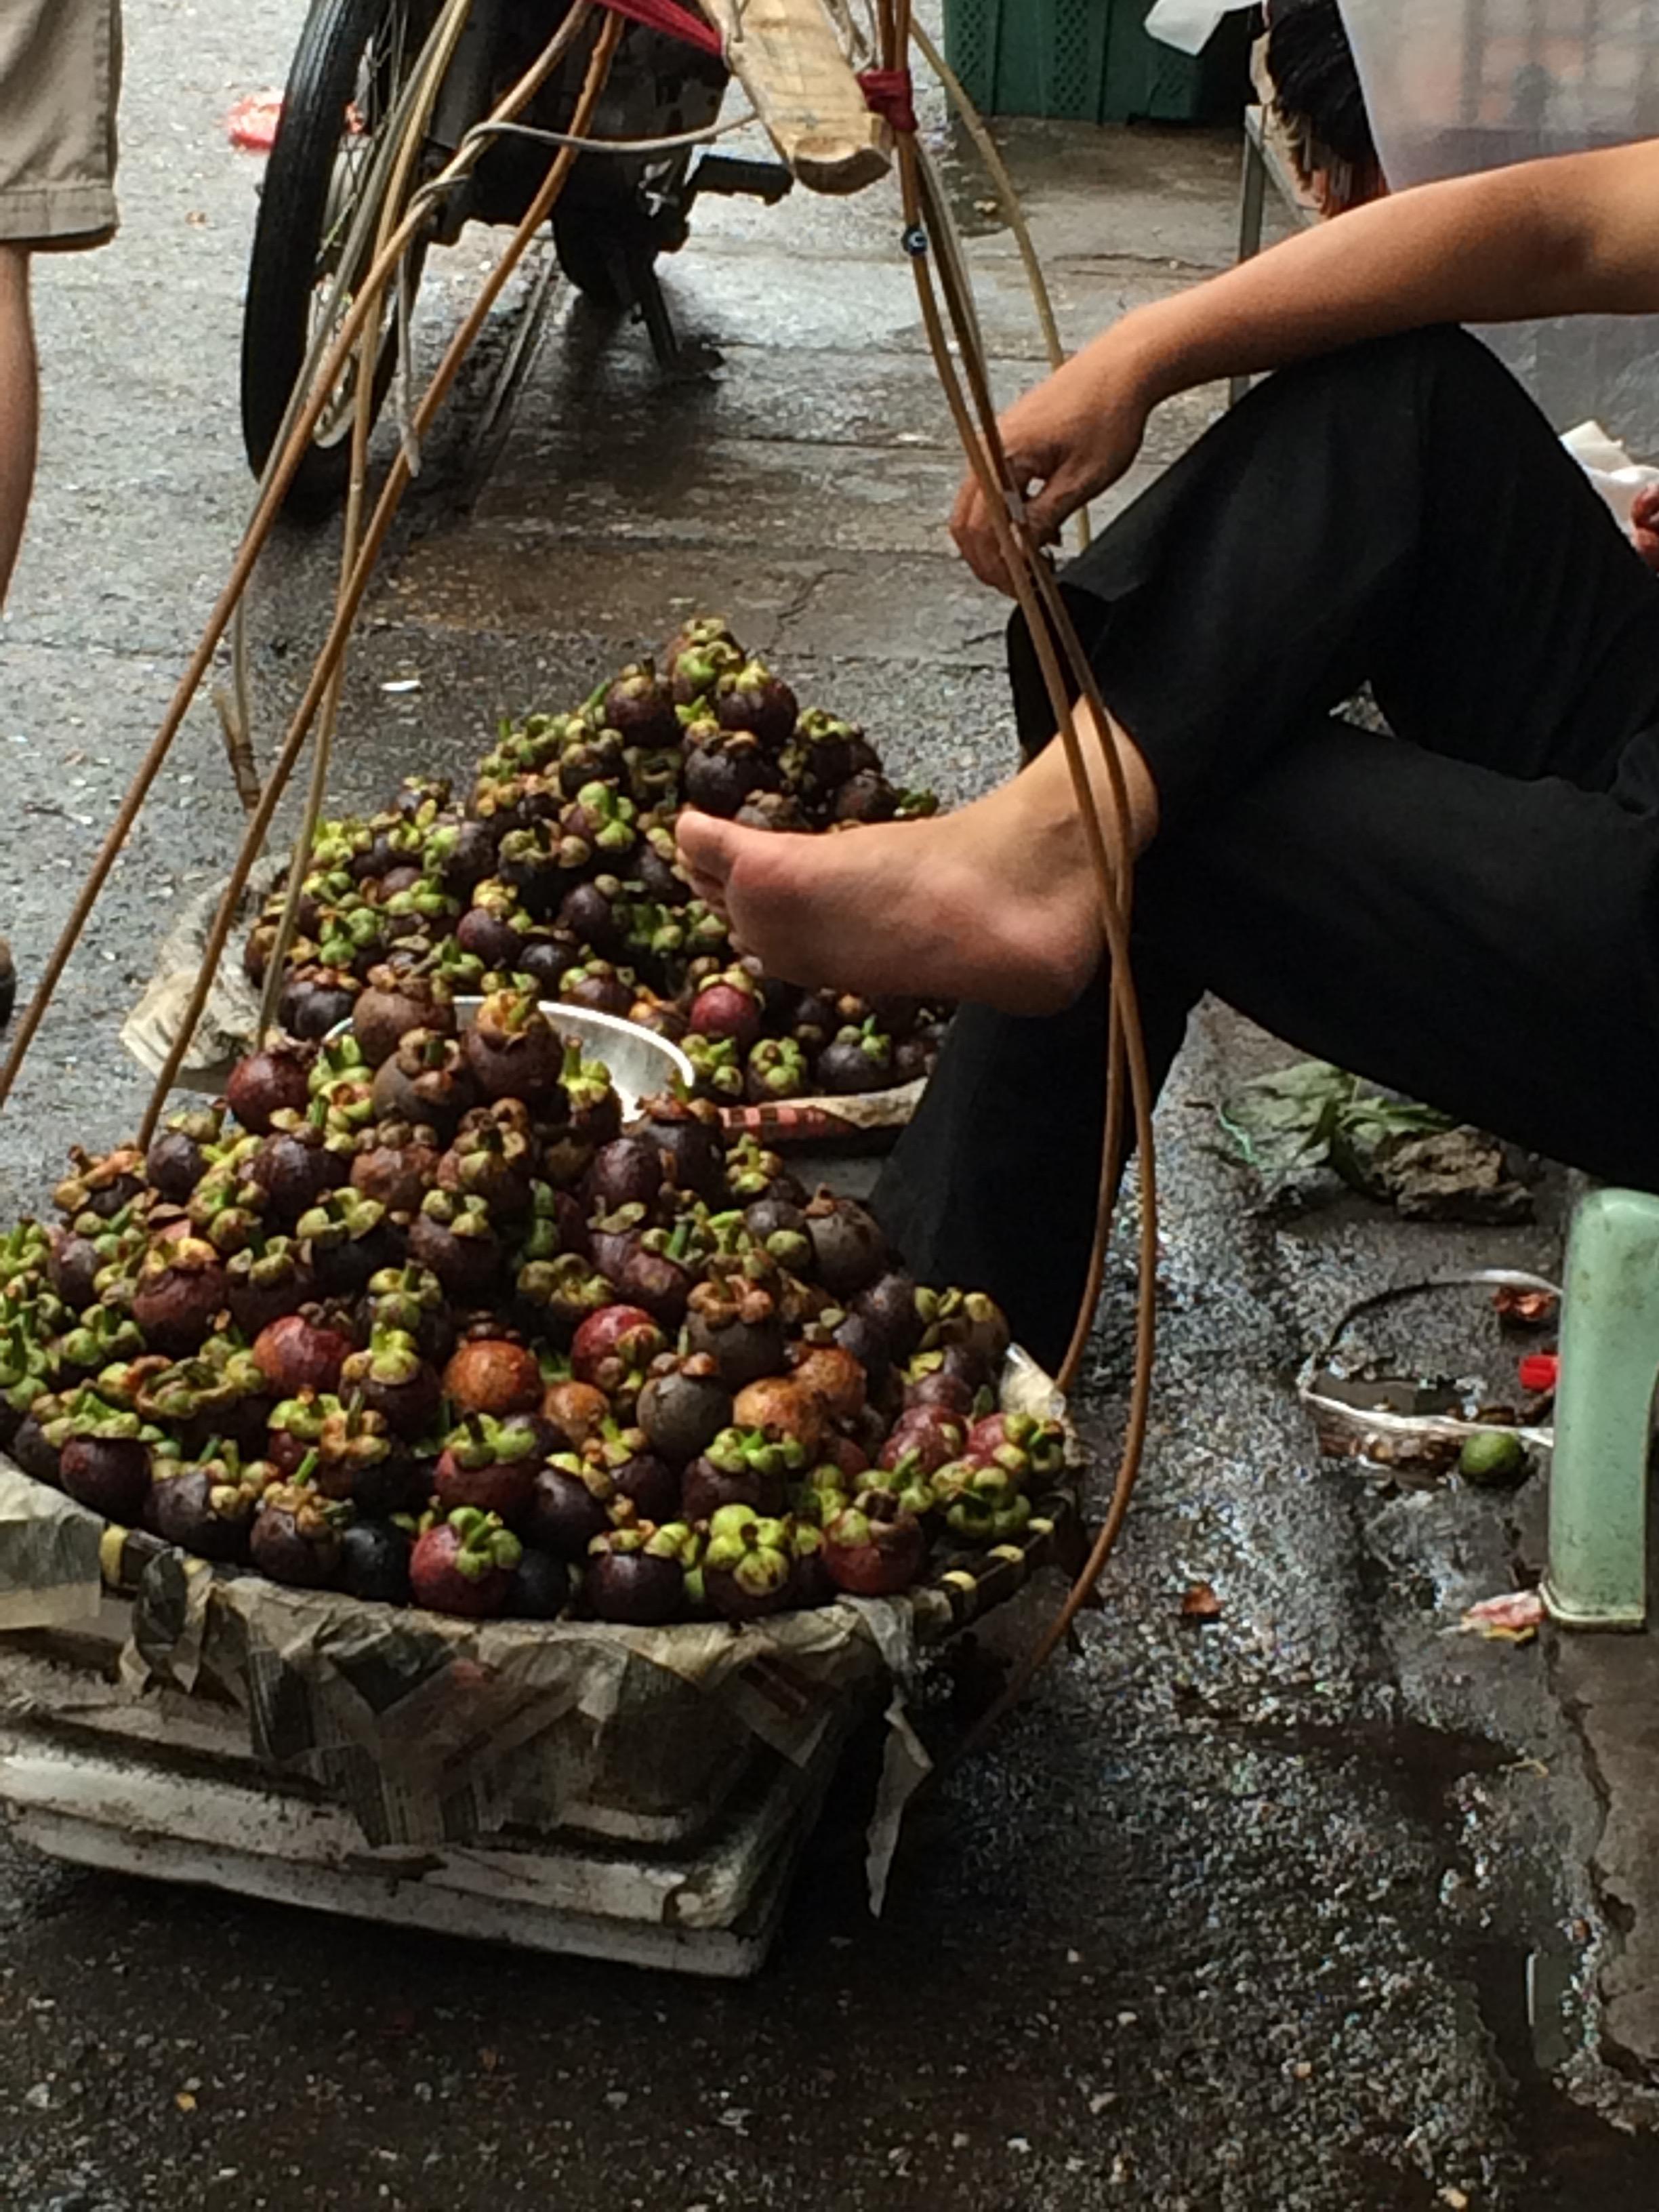 Sidewalk mangosteen seller